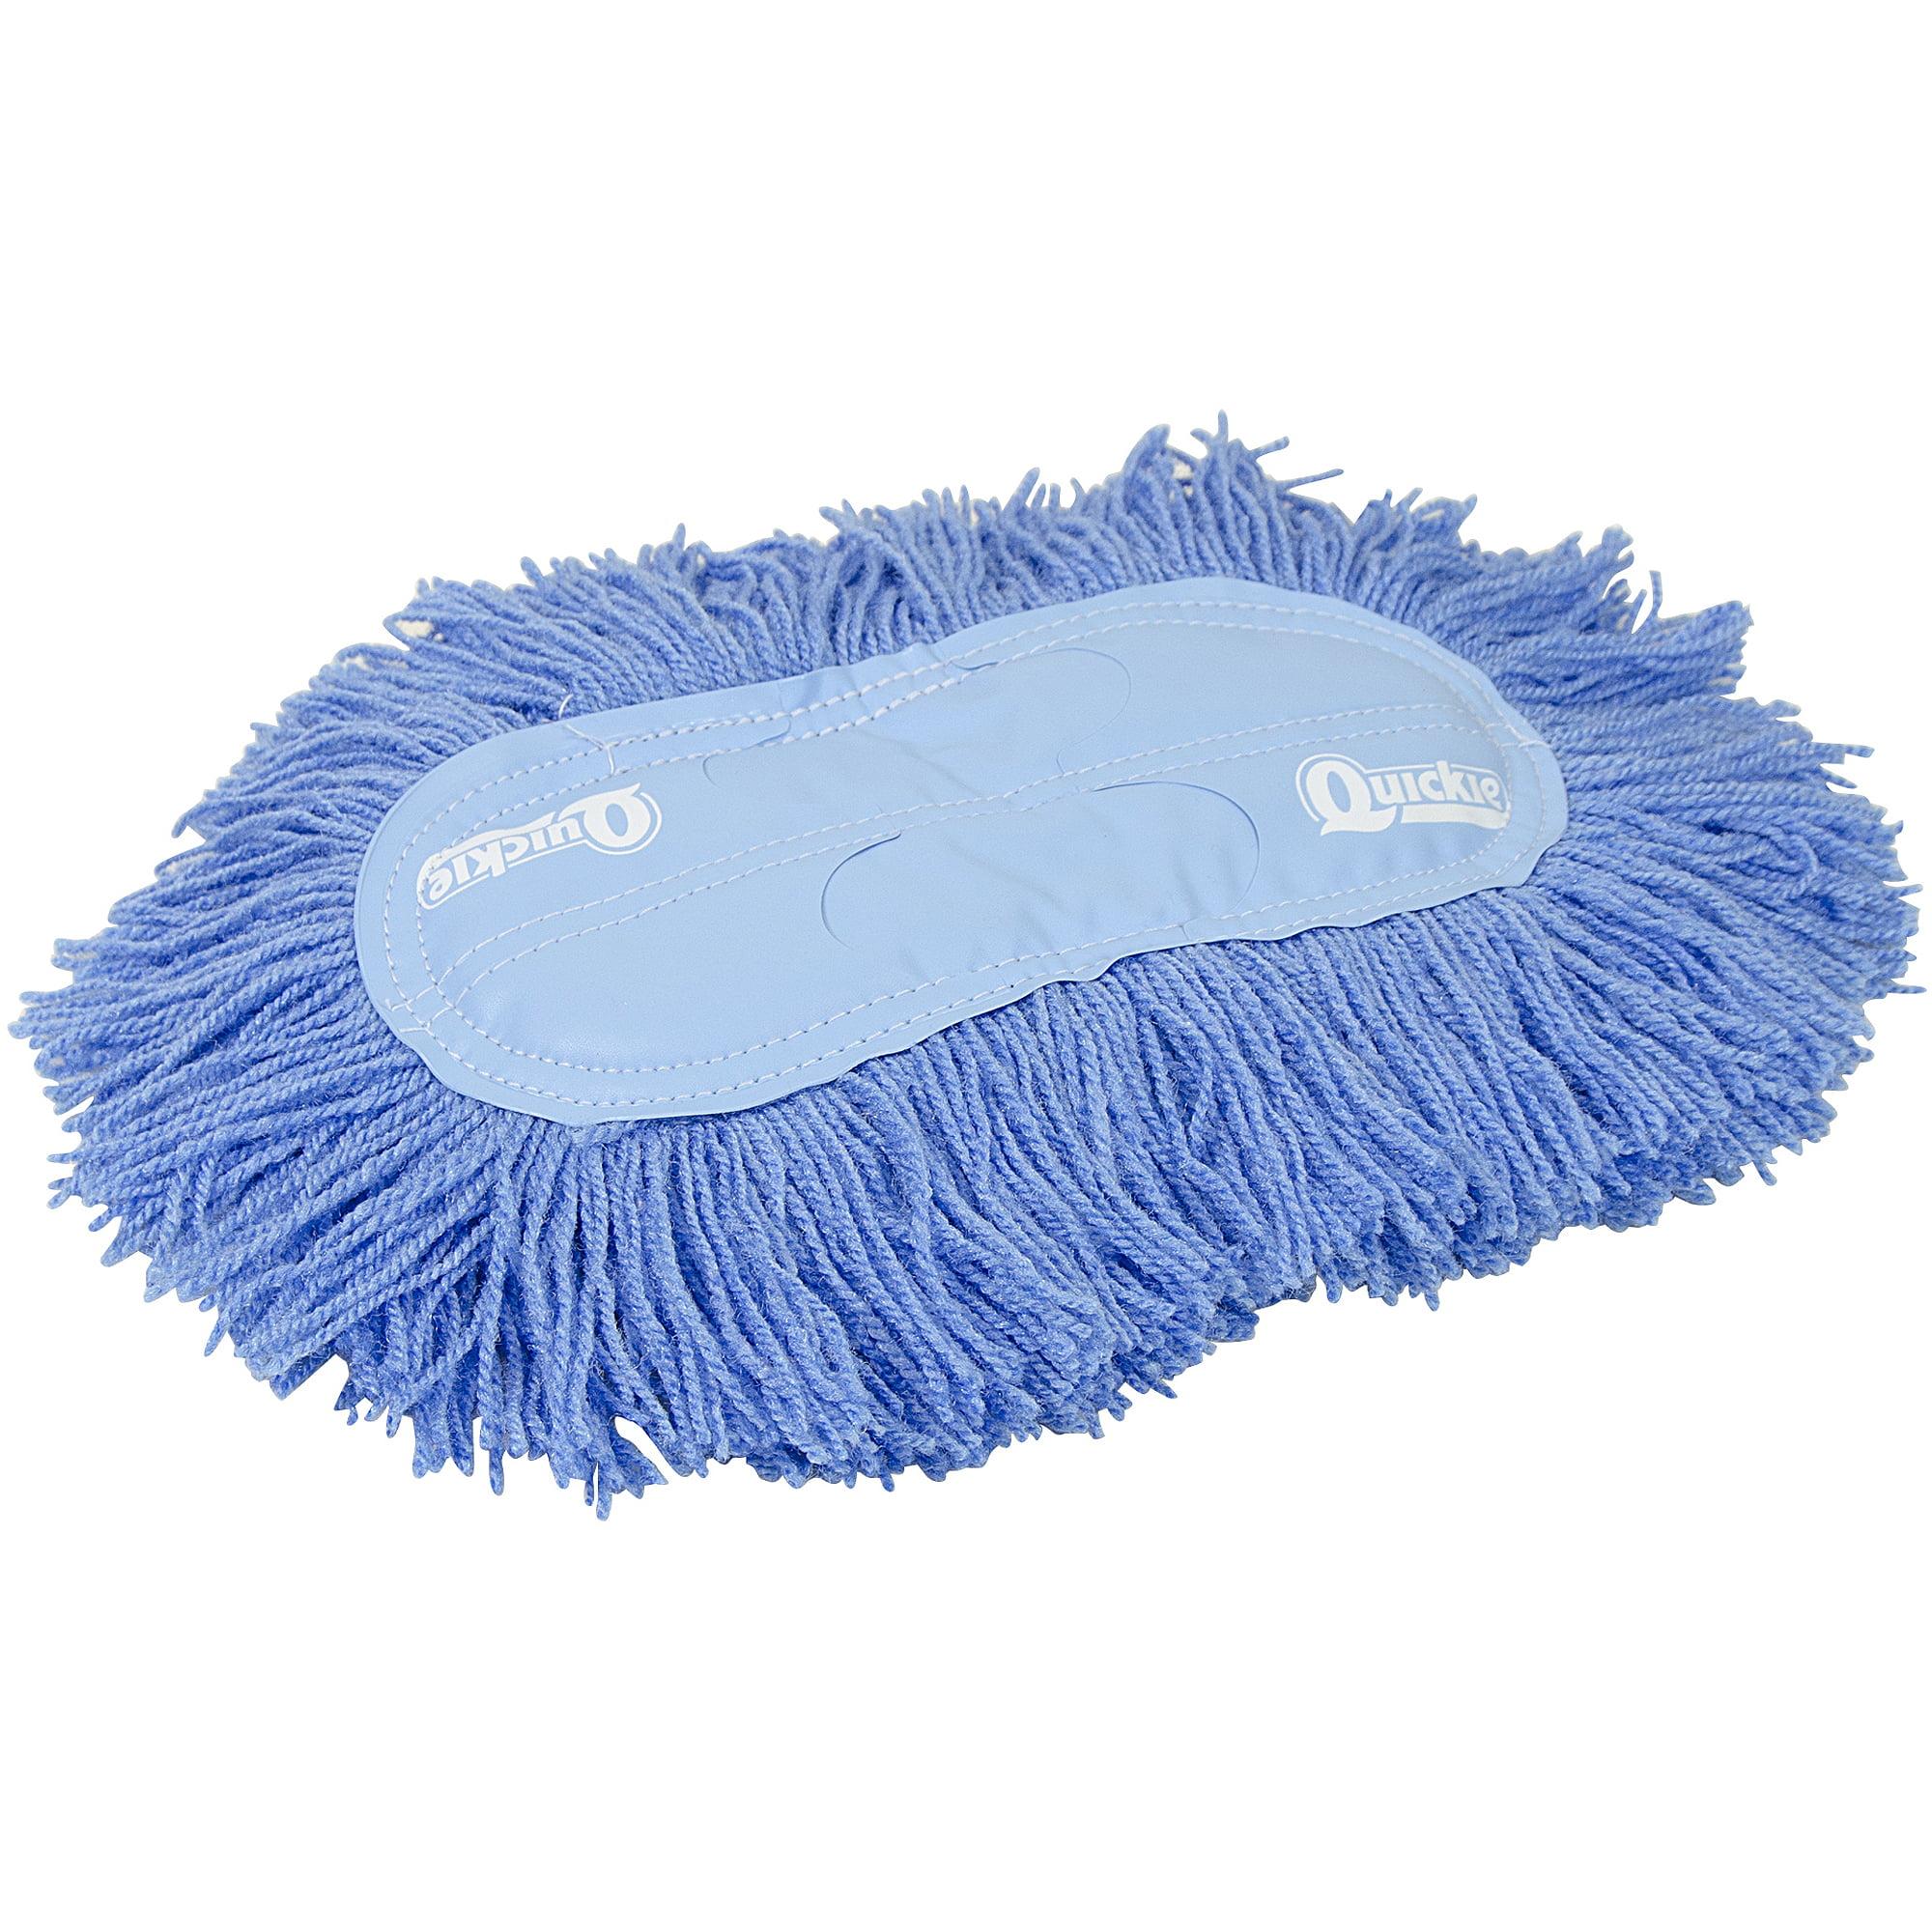 Quickie Swivel-Flex Nylon Dust Mop Refill